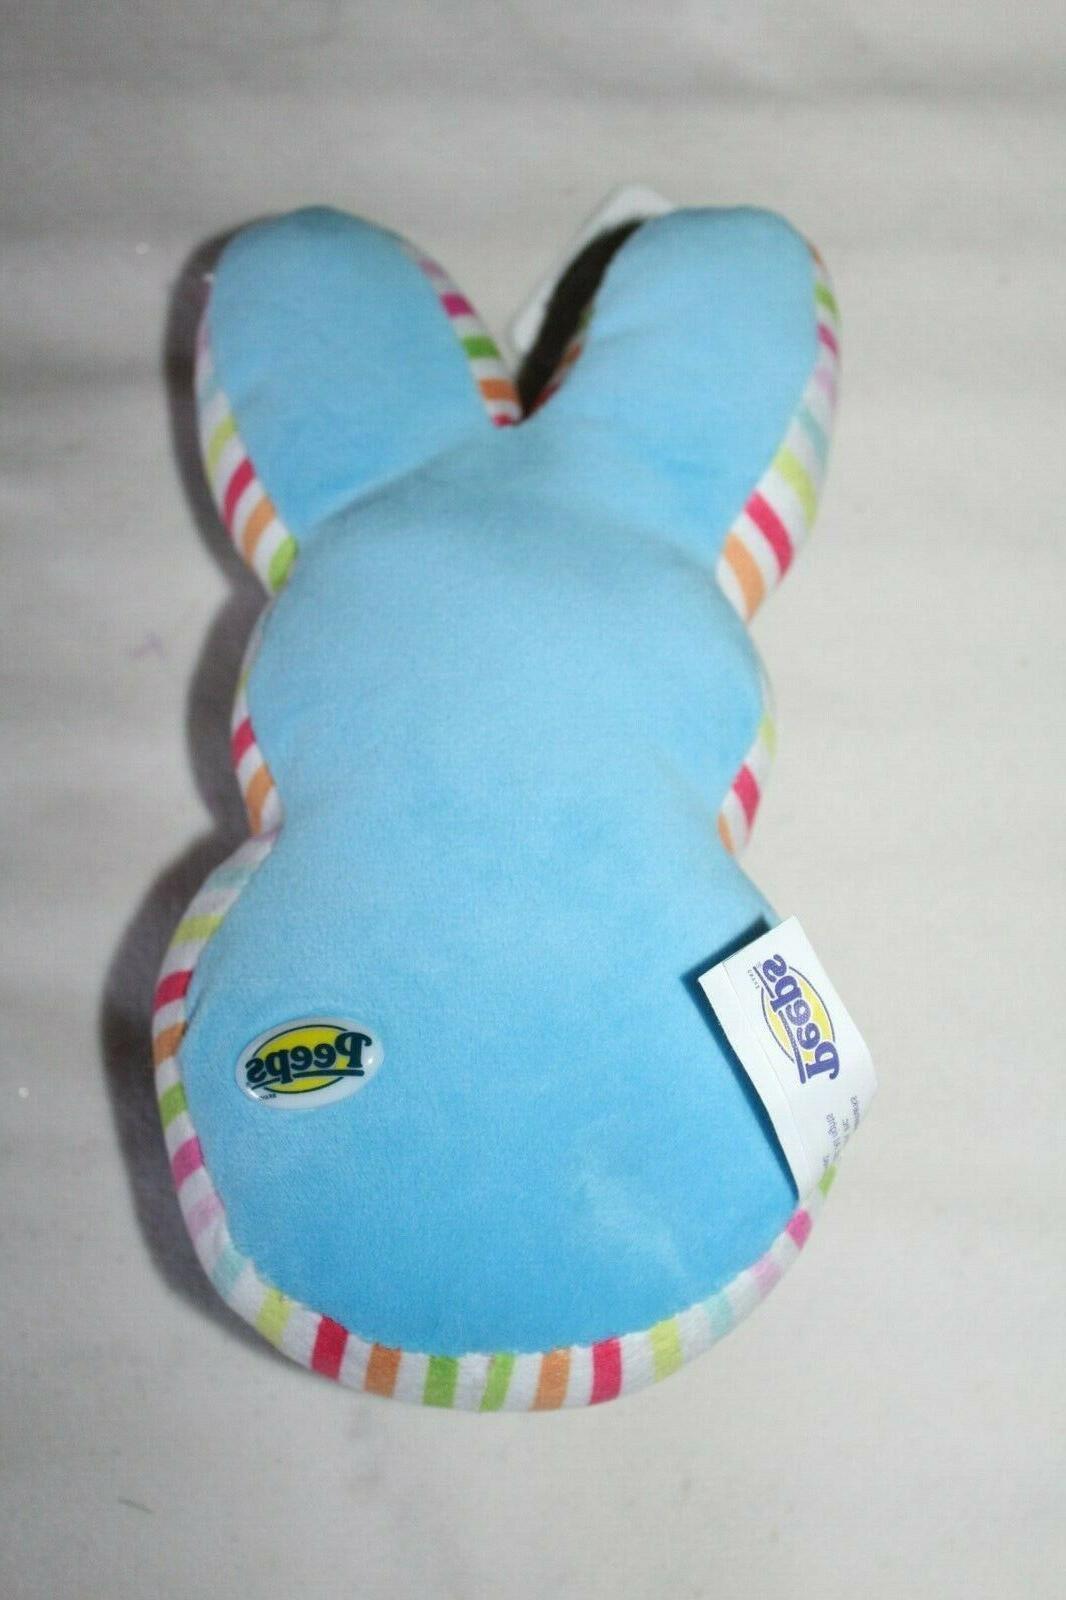 PEEP Easter BLUE BUNNY BAG Chick Animal Toy